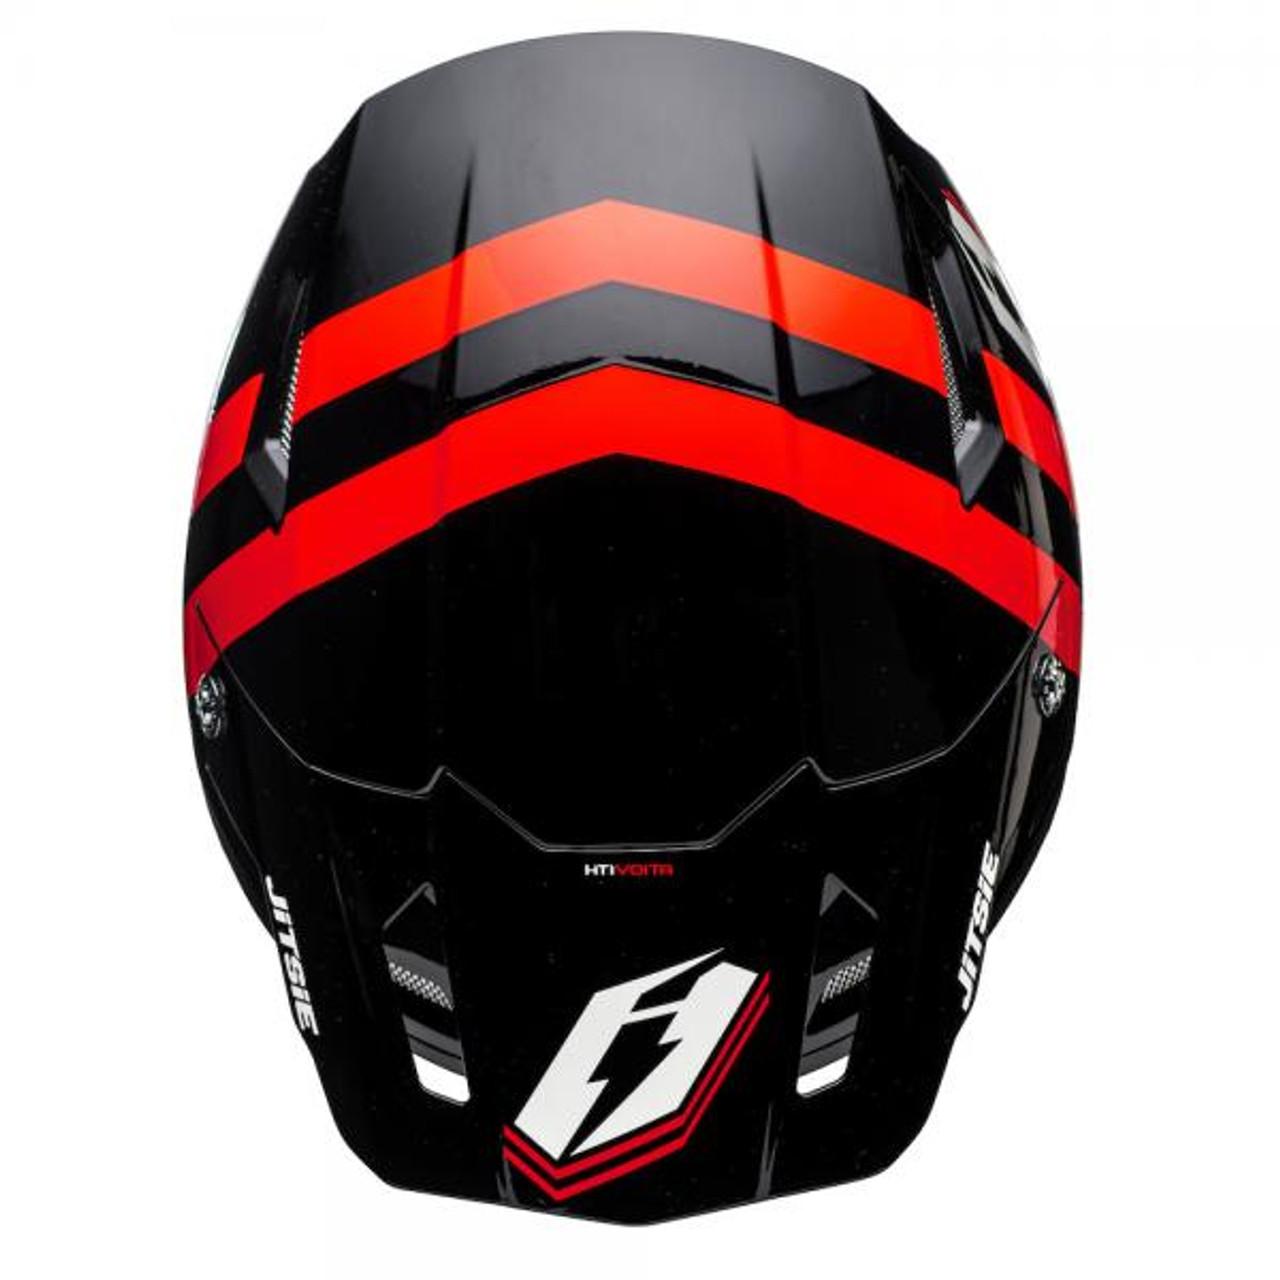 Helmet HT1 Voita black/ red